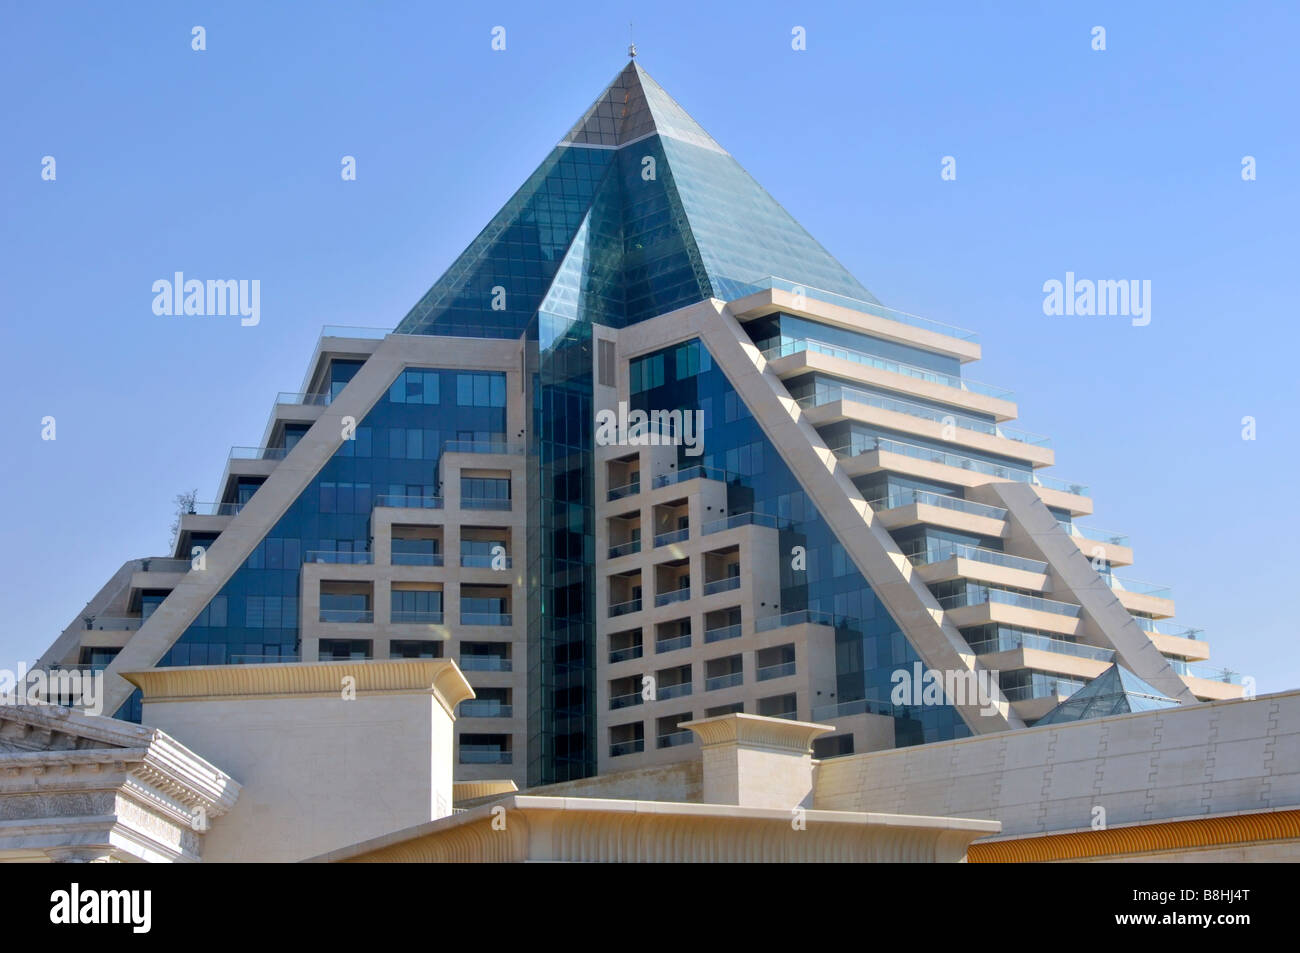 Dubai modern architecture building stock photo royalty for Dubai architecture moderne